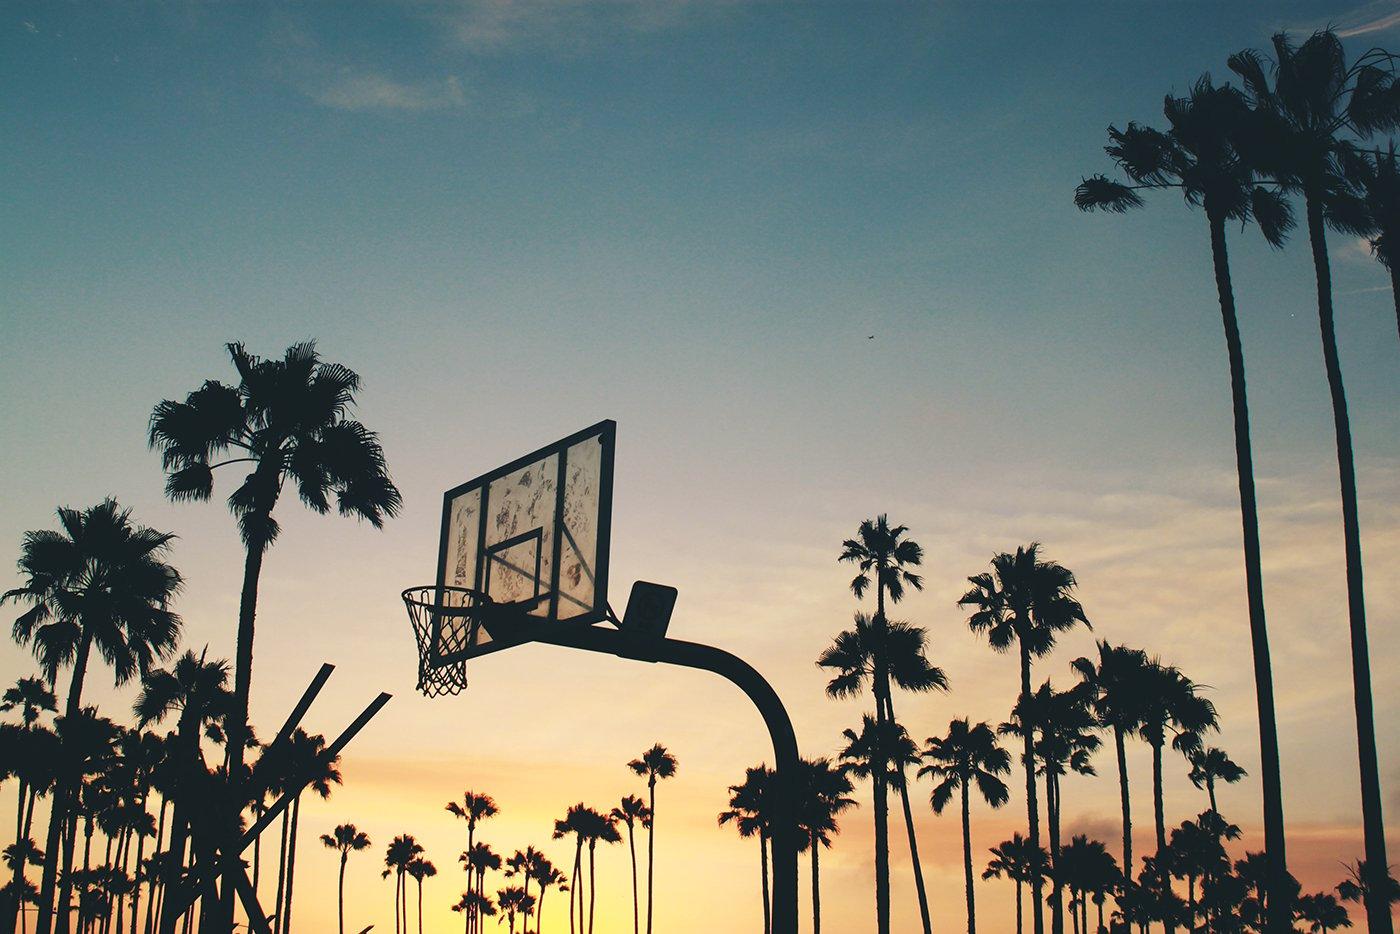 Basketball net at sunset